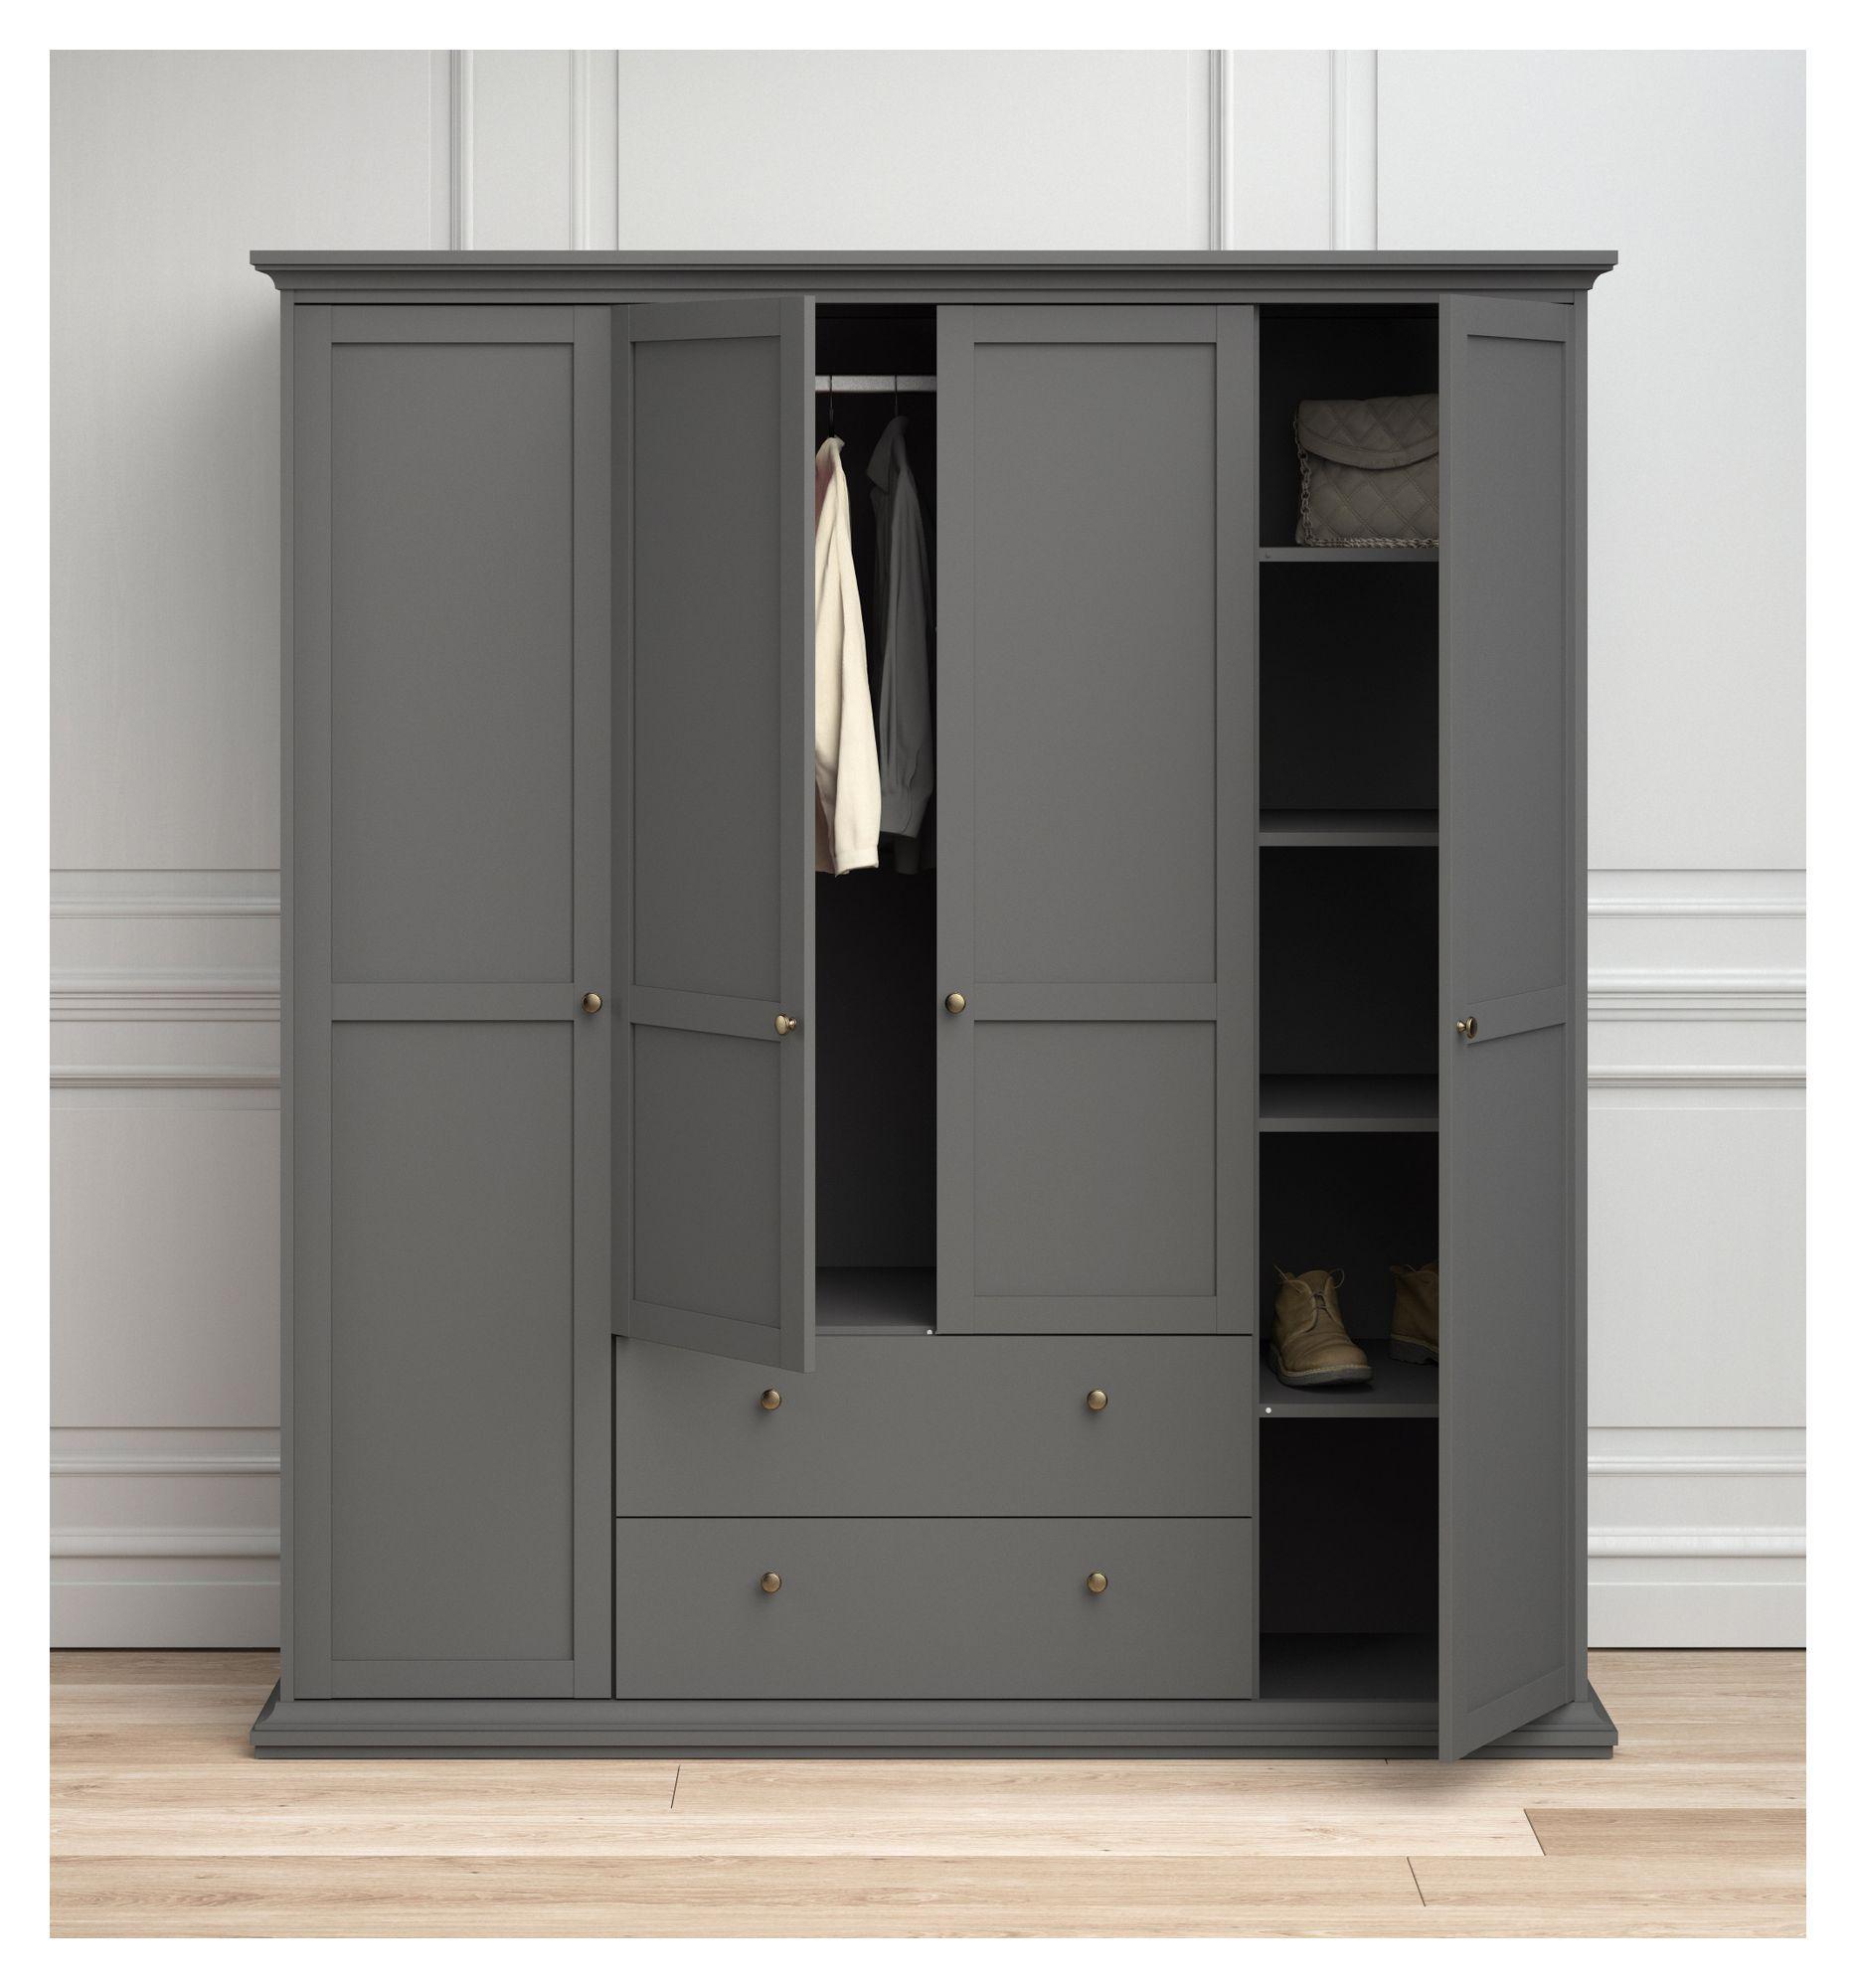 Paris Garderobeskab 4 låger + 2 skuffer - Mat grå